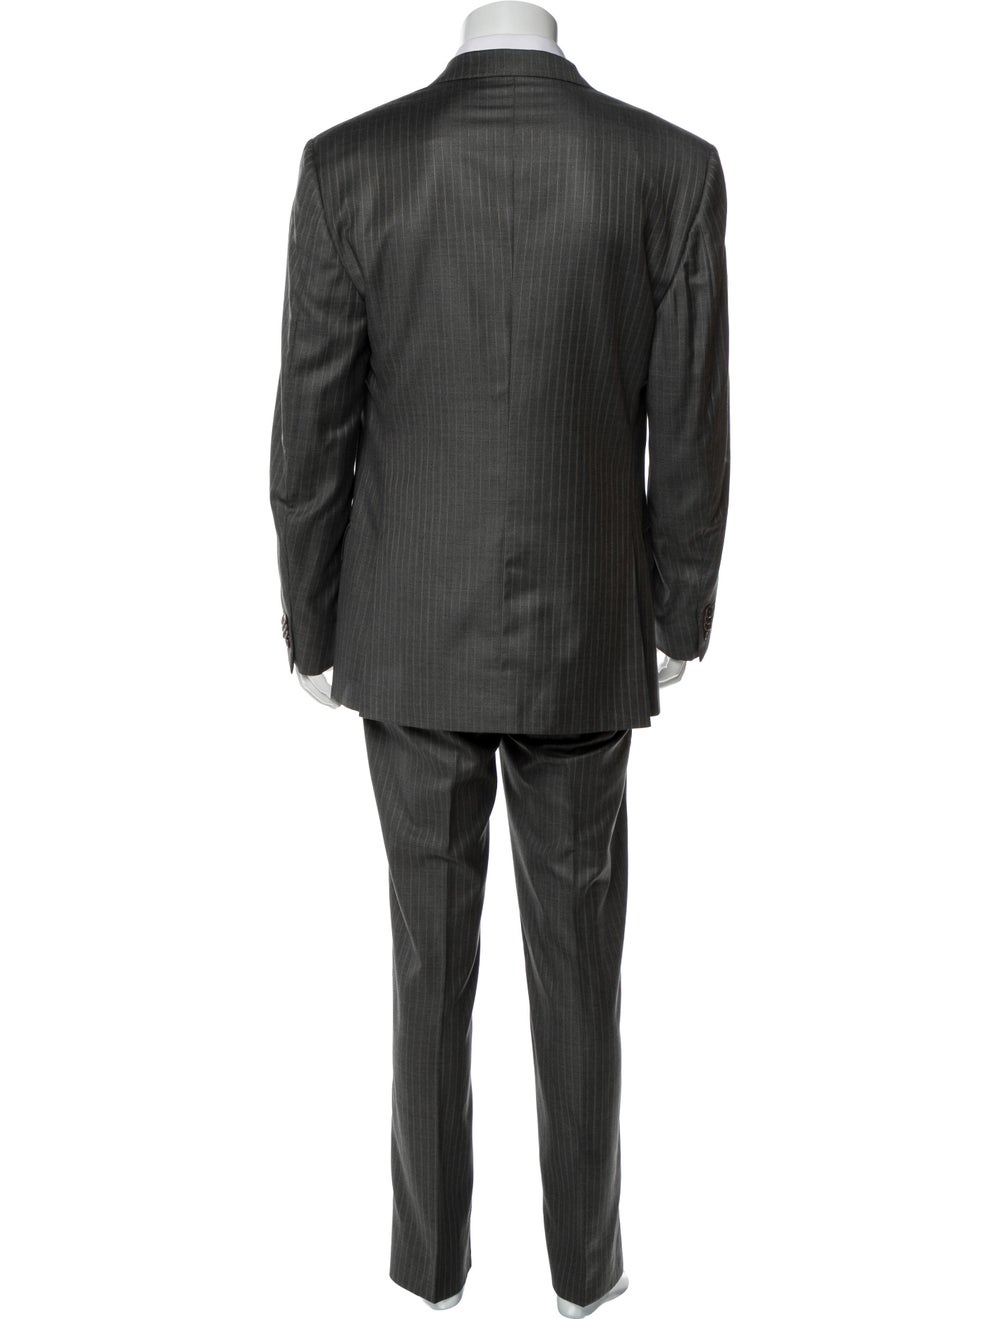 Ermenegildo Zegna Pinstripe Two-Piece Suit navy - image 3